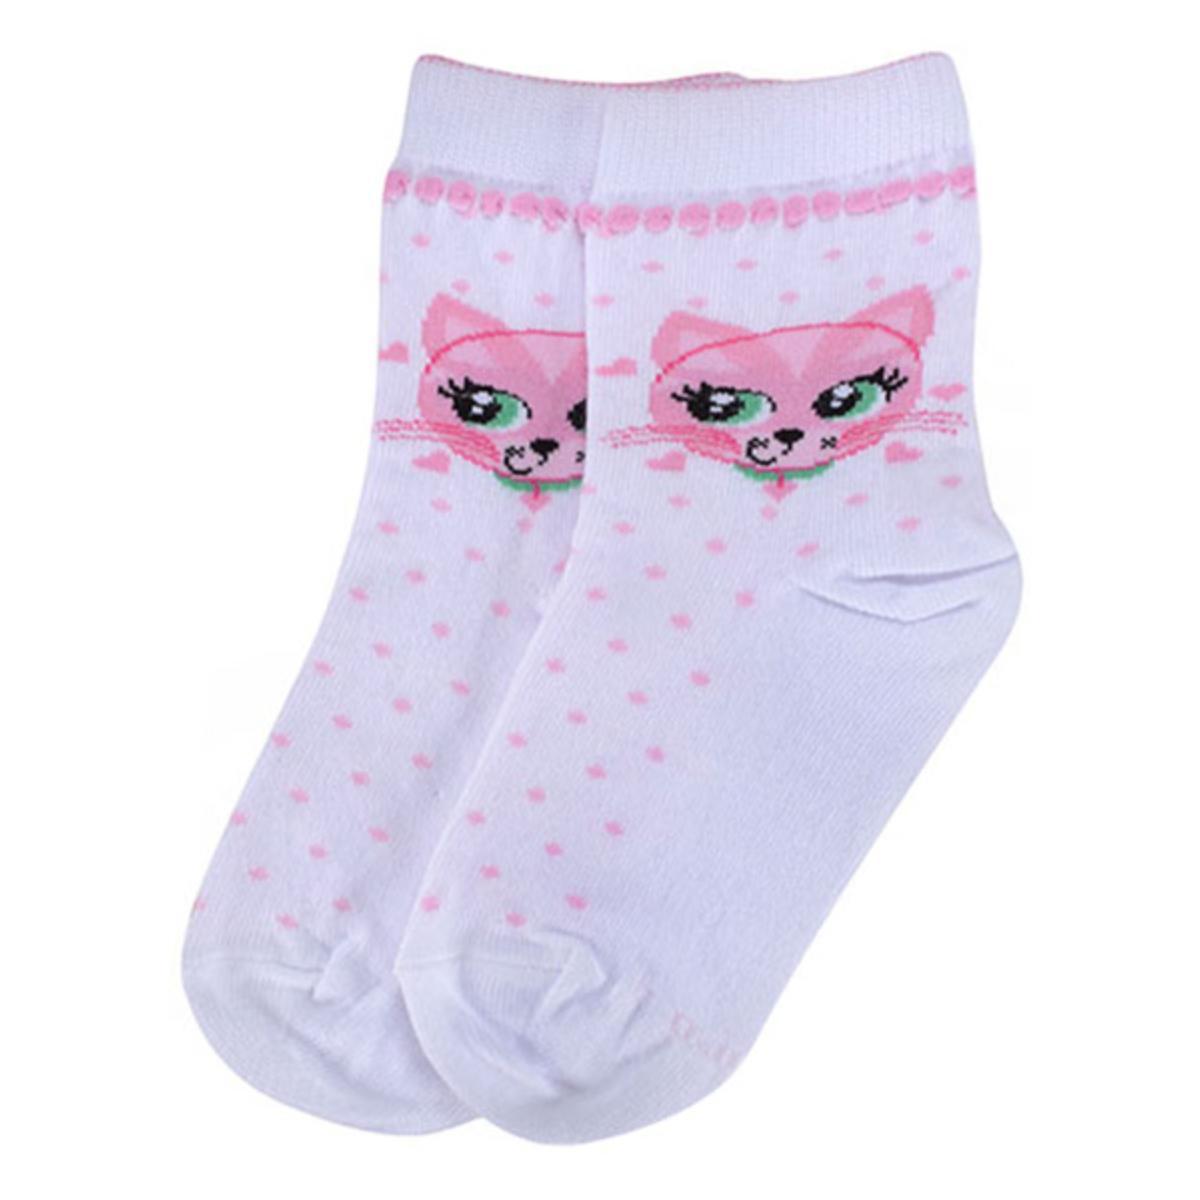 Meia Fem Infantil Lupo 02680 245 1120 Branco/rosa